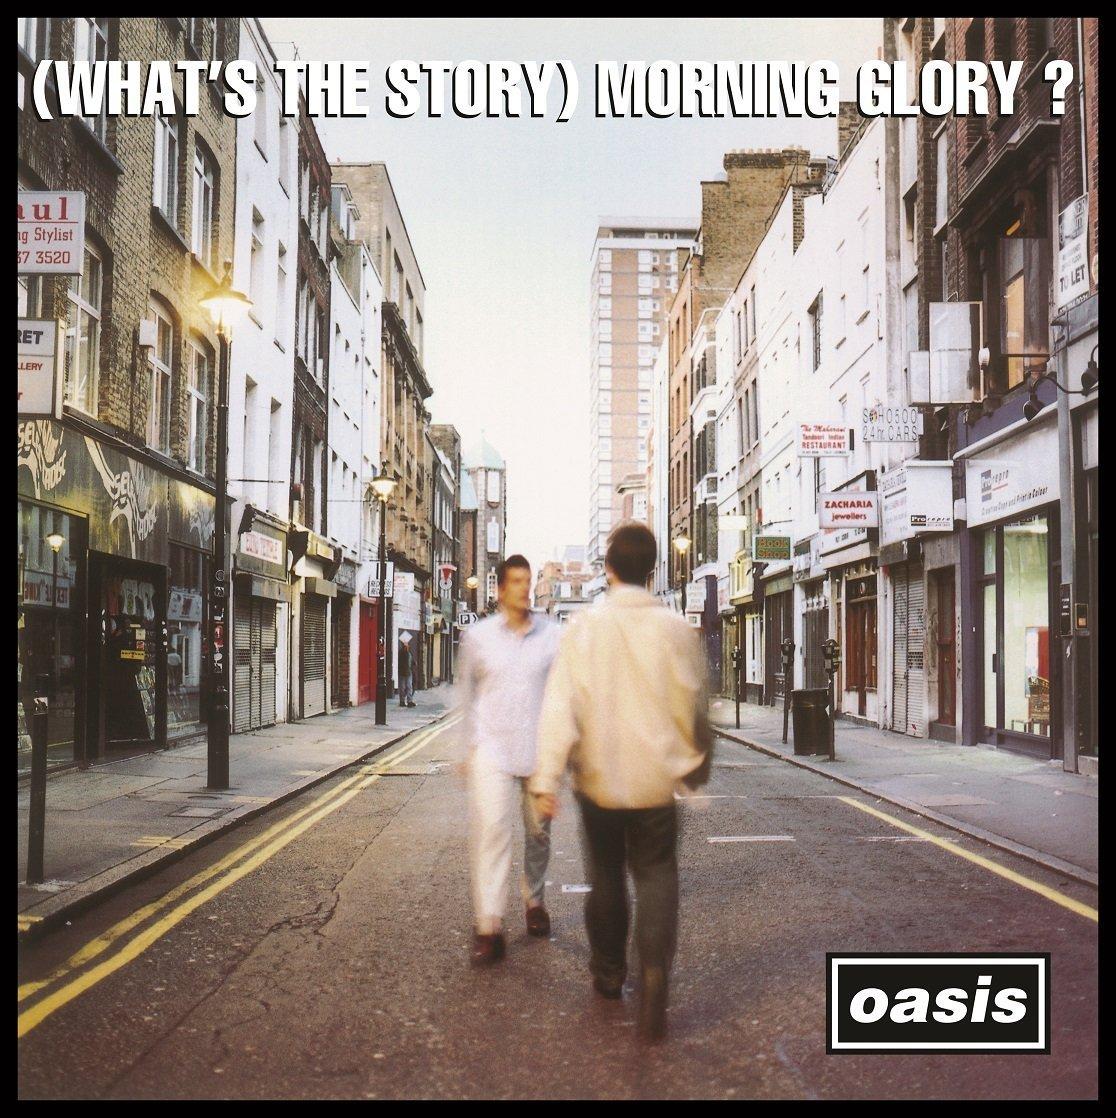 Vandaag (3 oktober) 1995: Oasis brengt What's the Story Morning Glory uit!